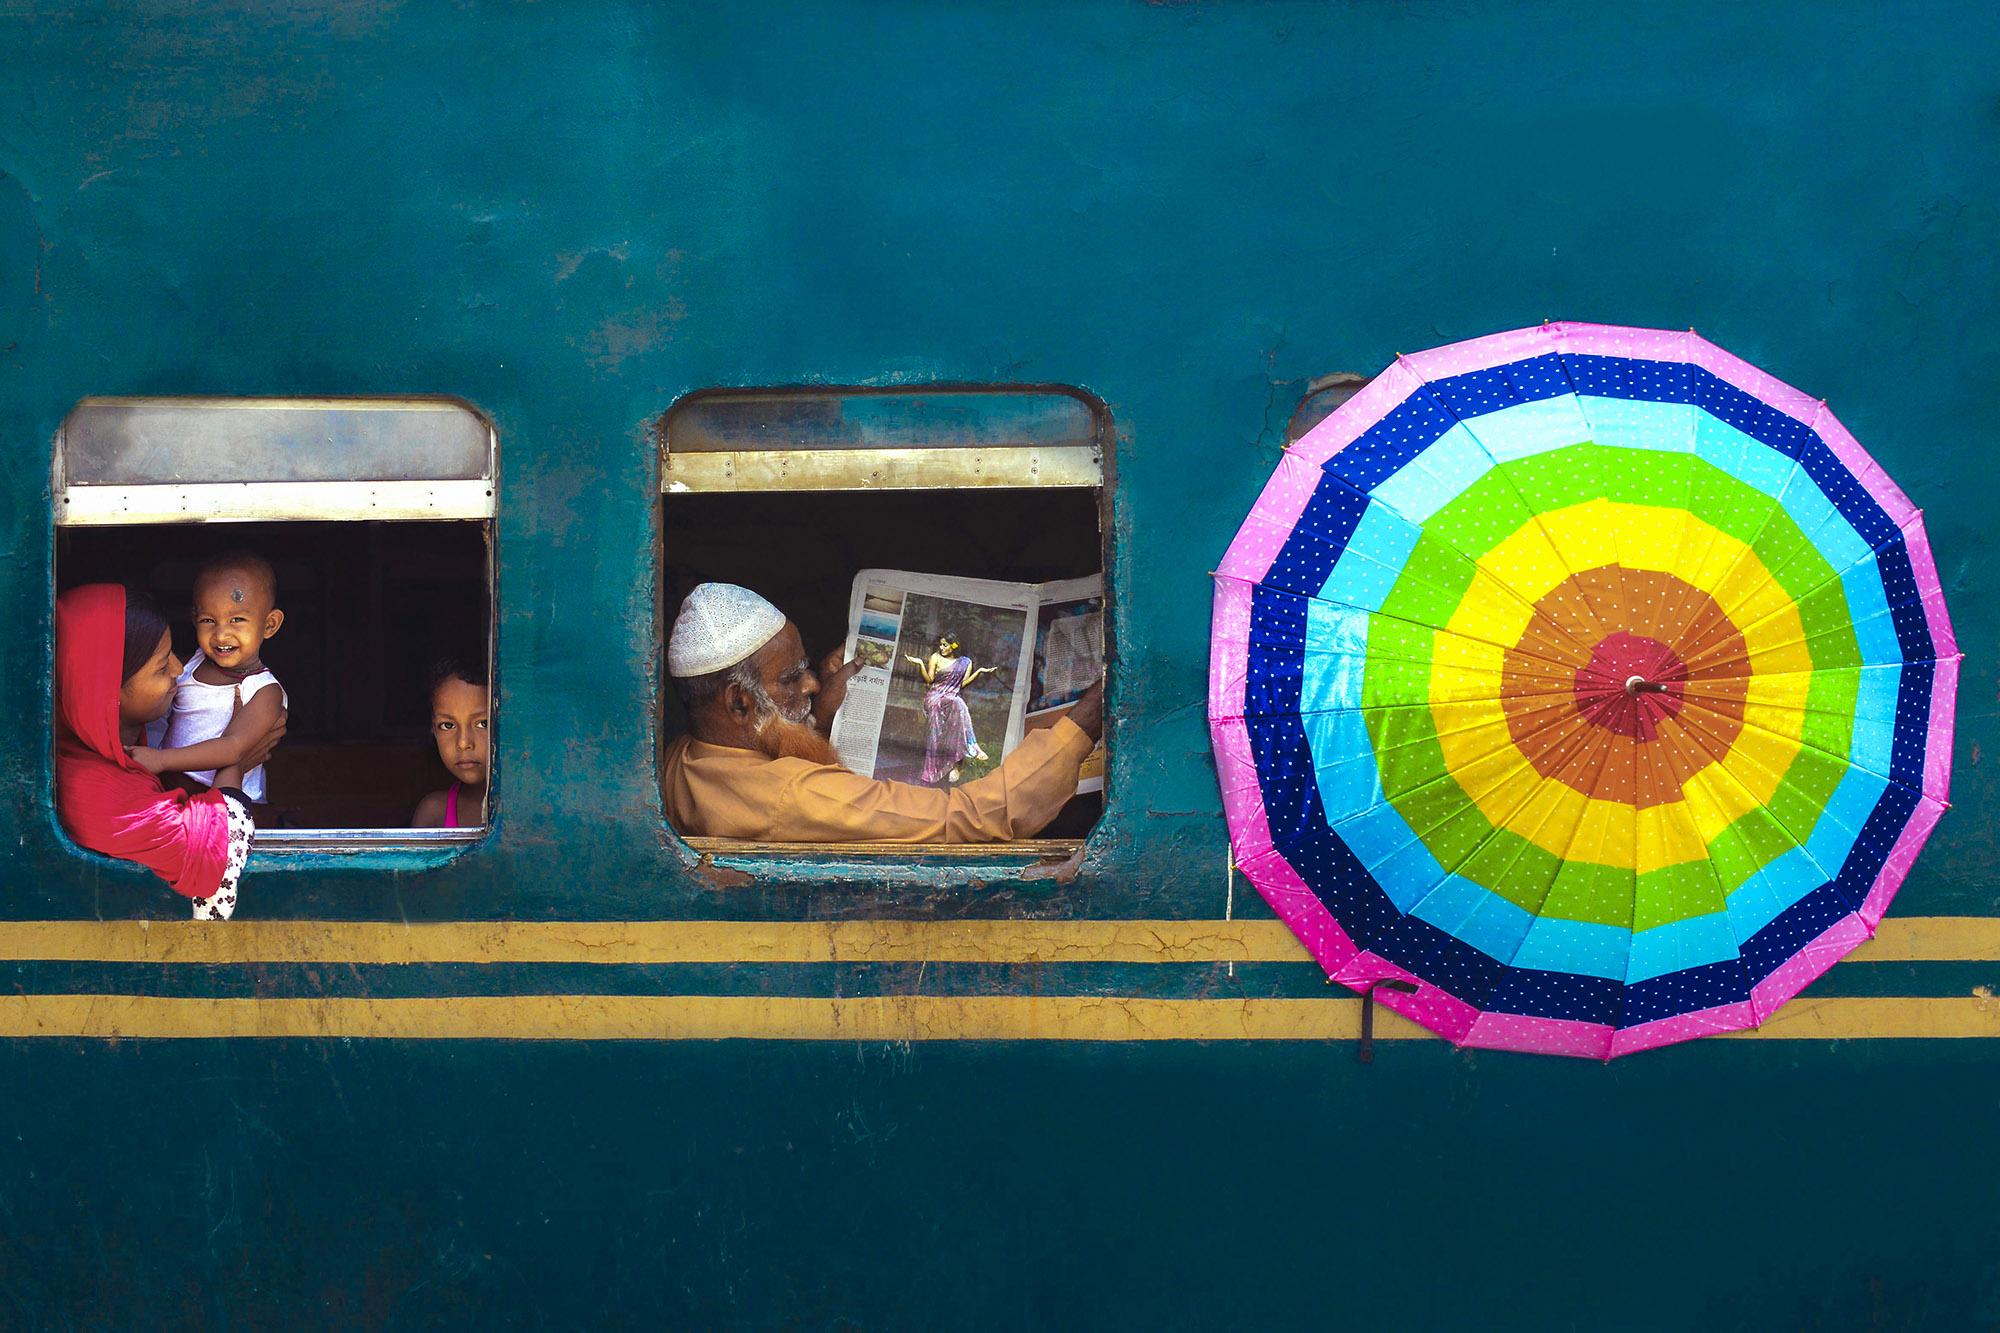 Gagnant de la photographie de voyage Sujon Adhikary